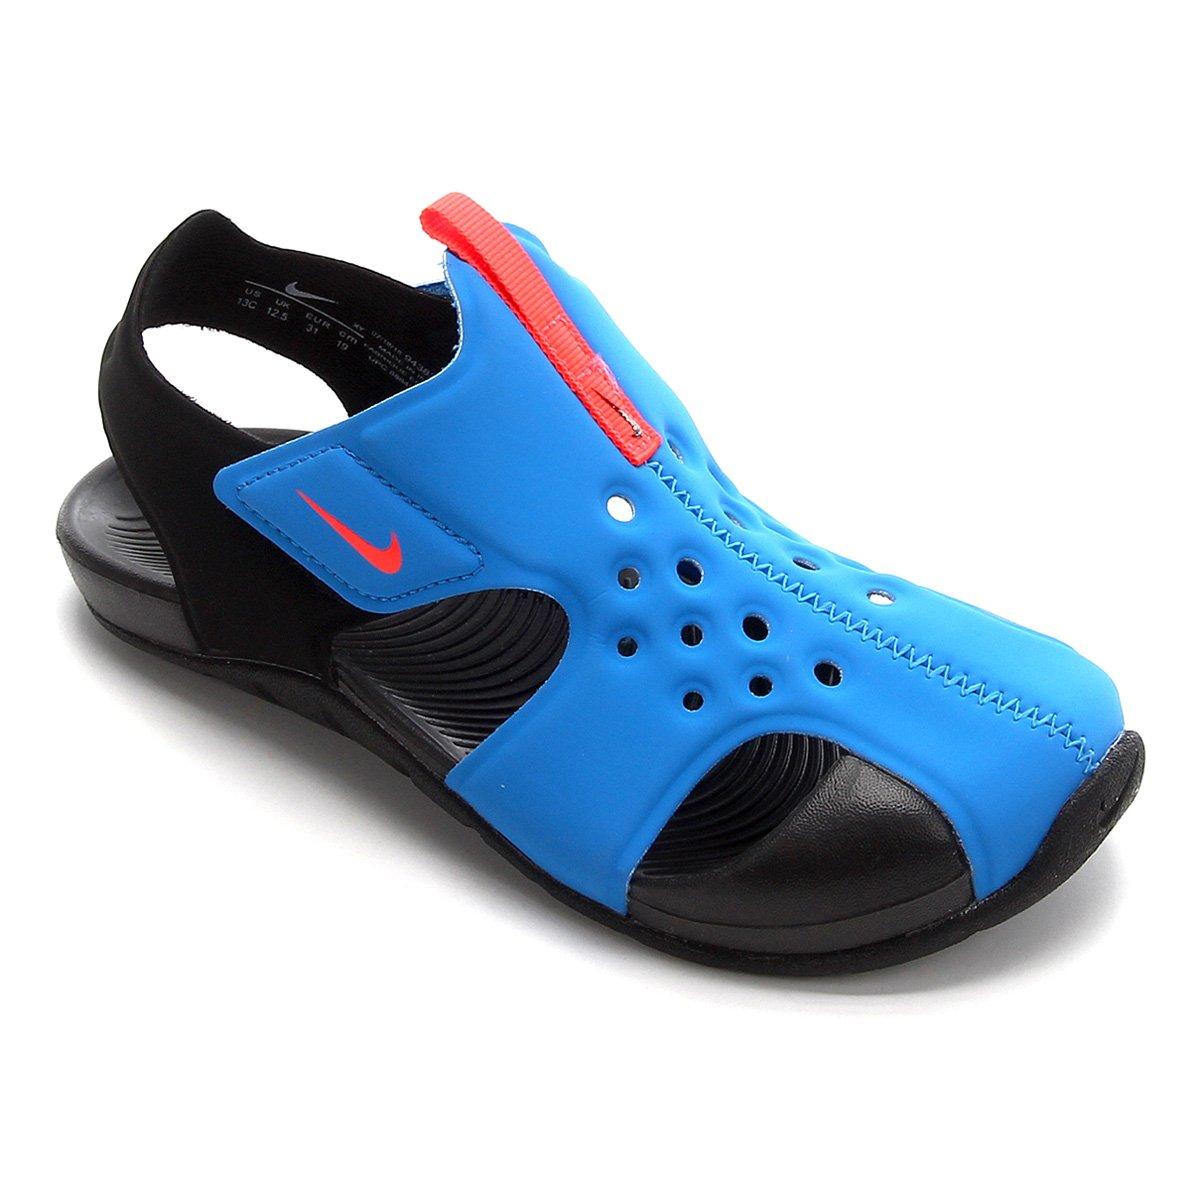 outlet brand new in stock Sandália Infantil Nike Sunray Protect 2 - Azul e Preto